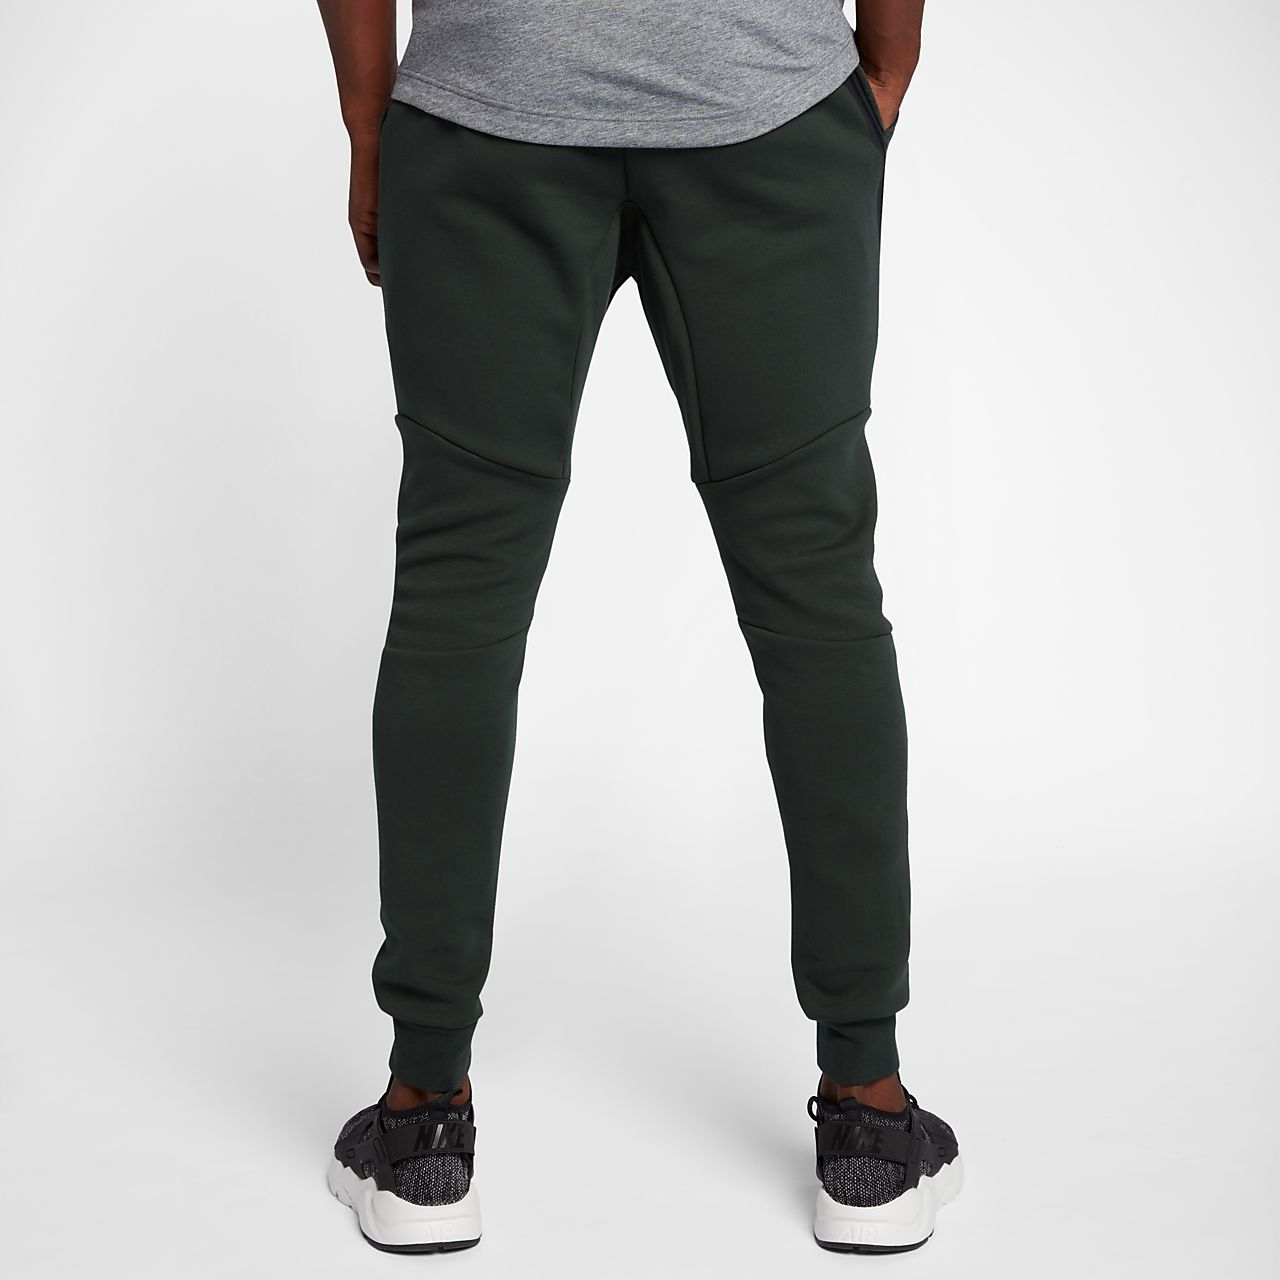 Running Shoes Fleece Fabric